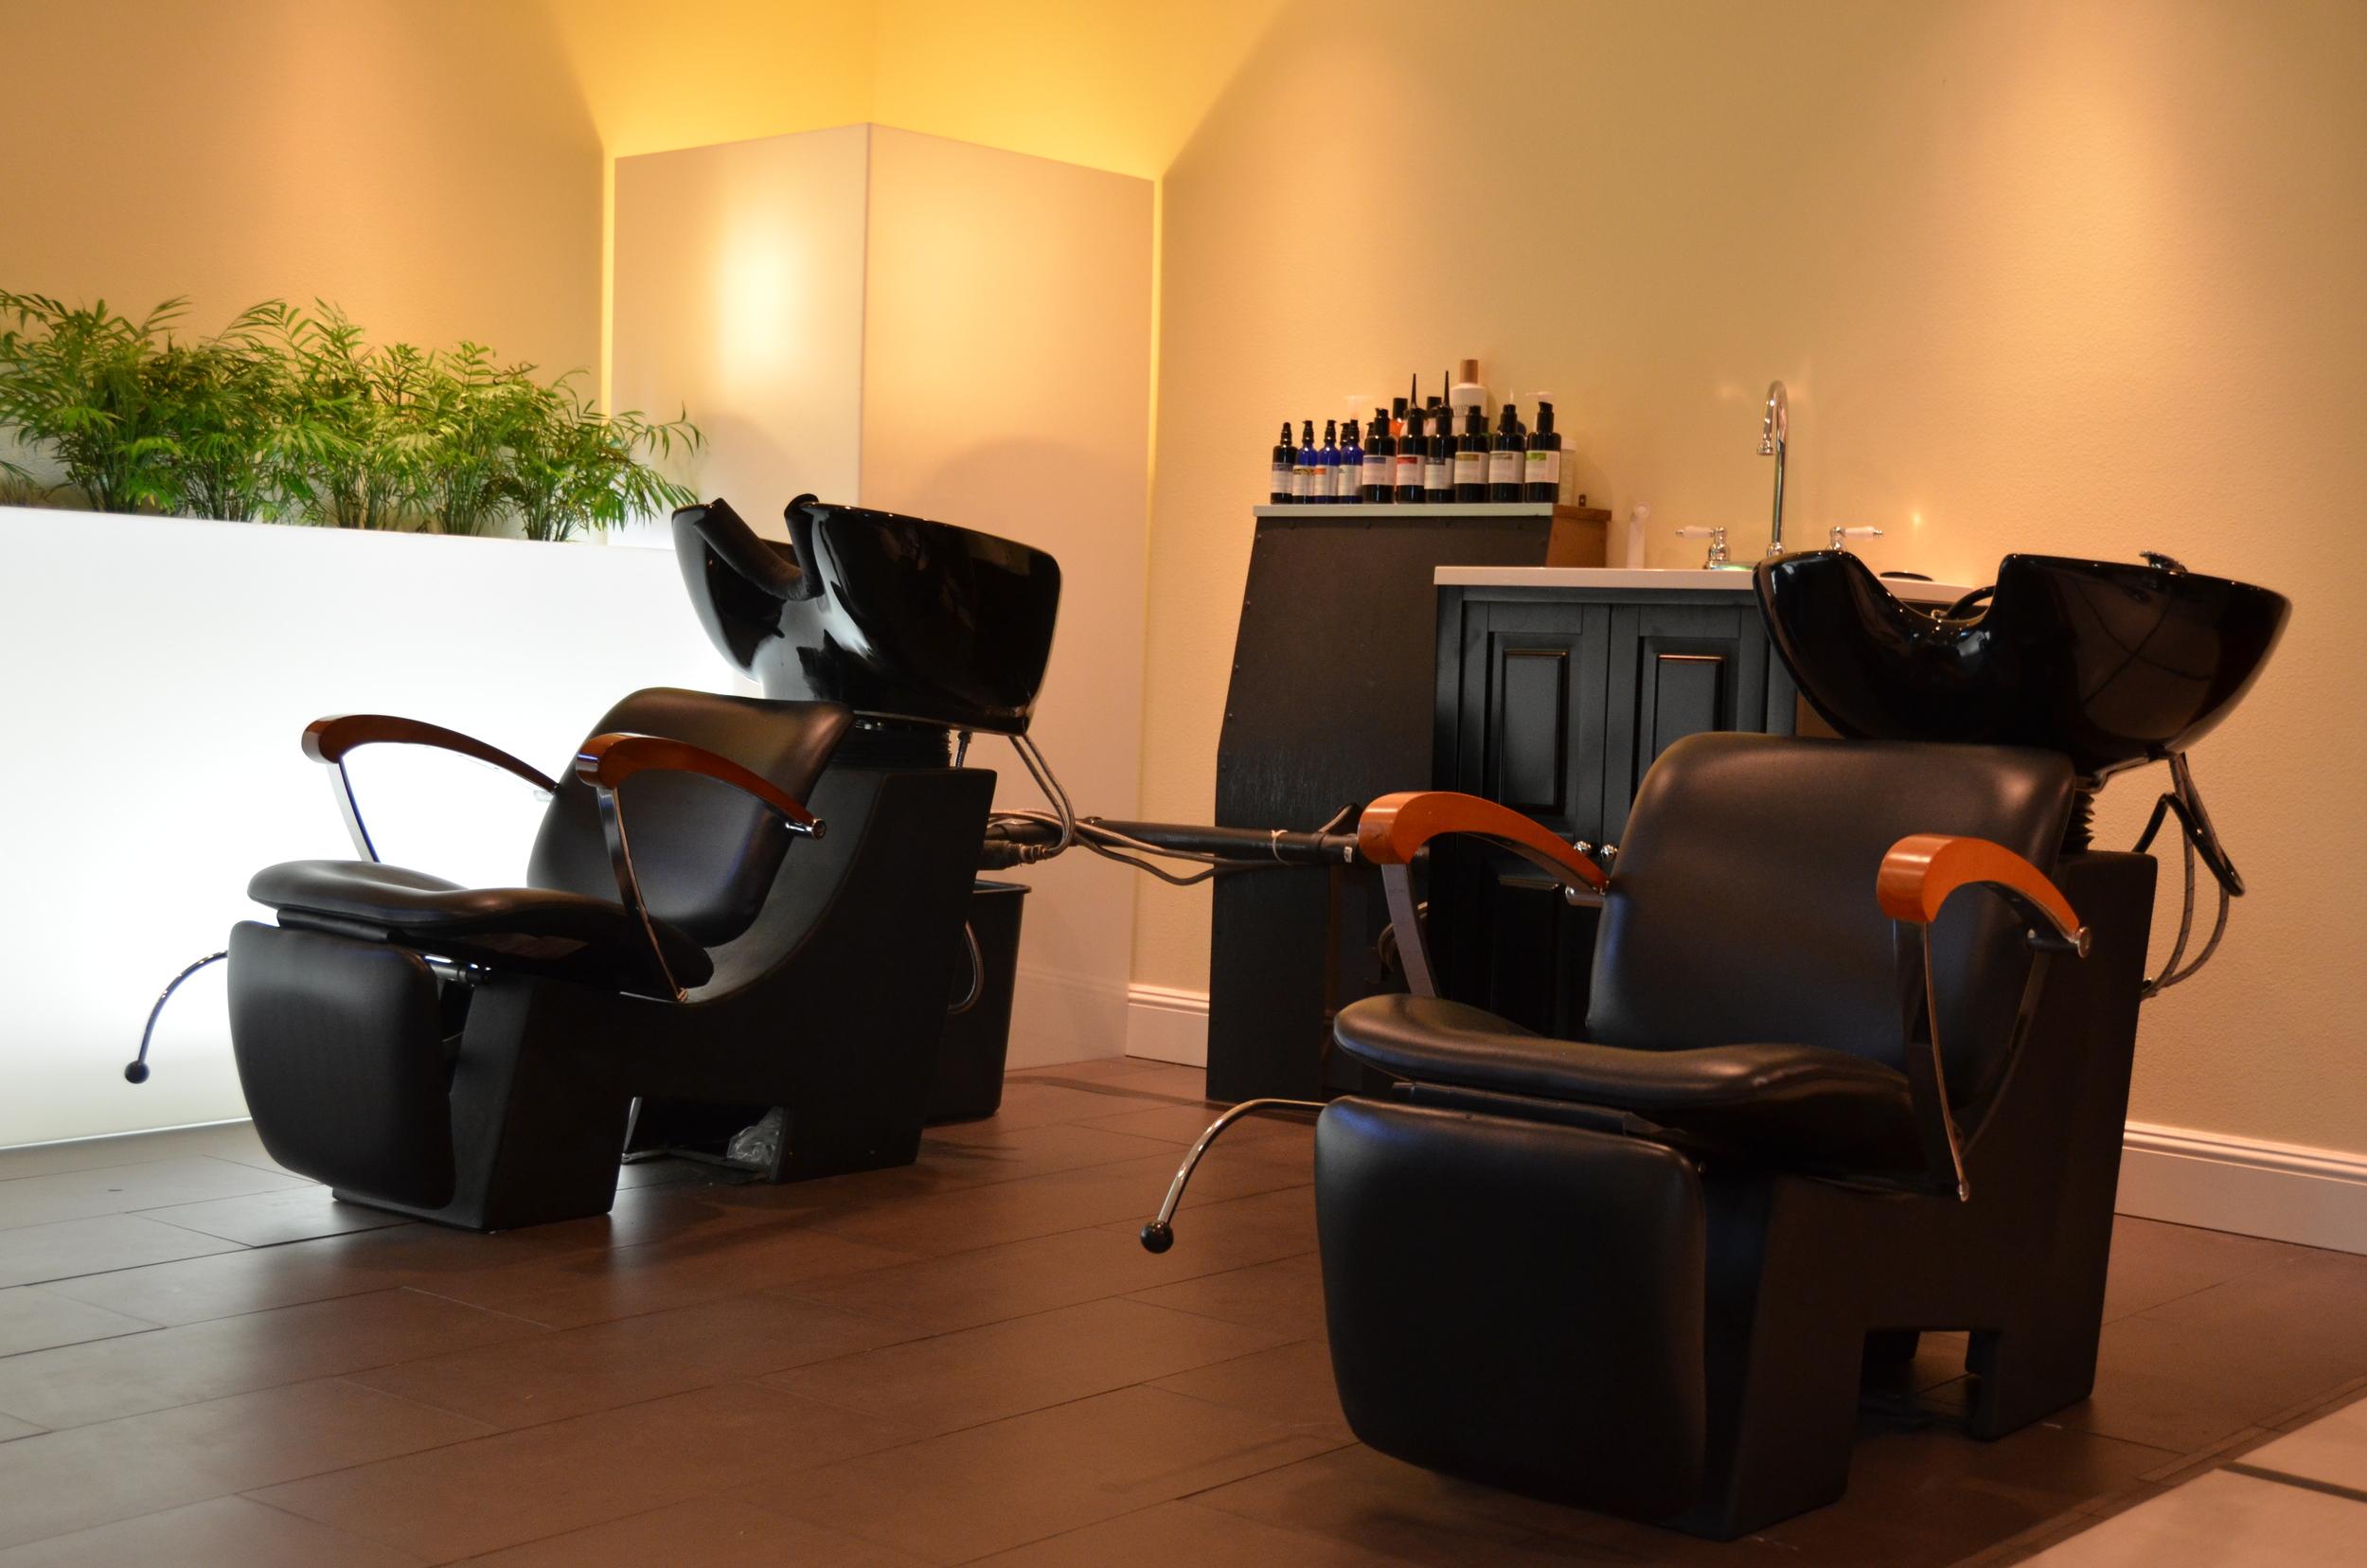 salon pictures for Craigslist 002.JPG